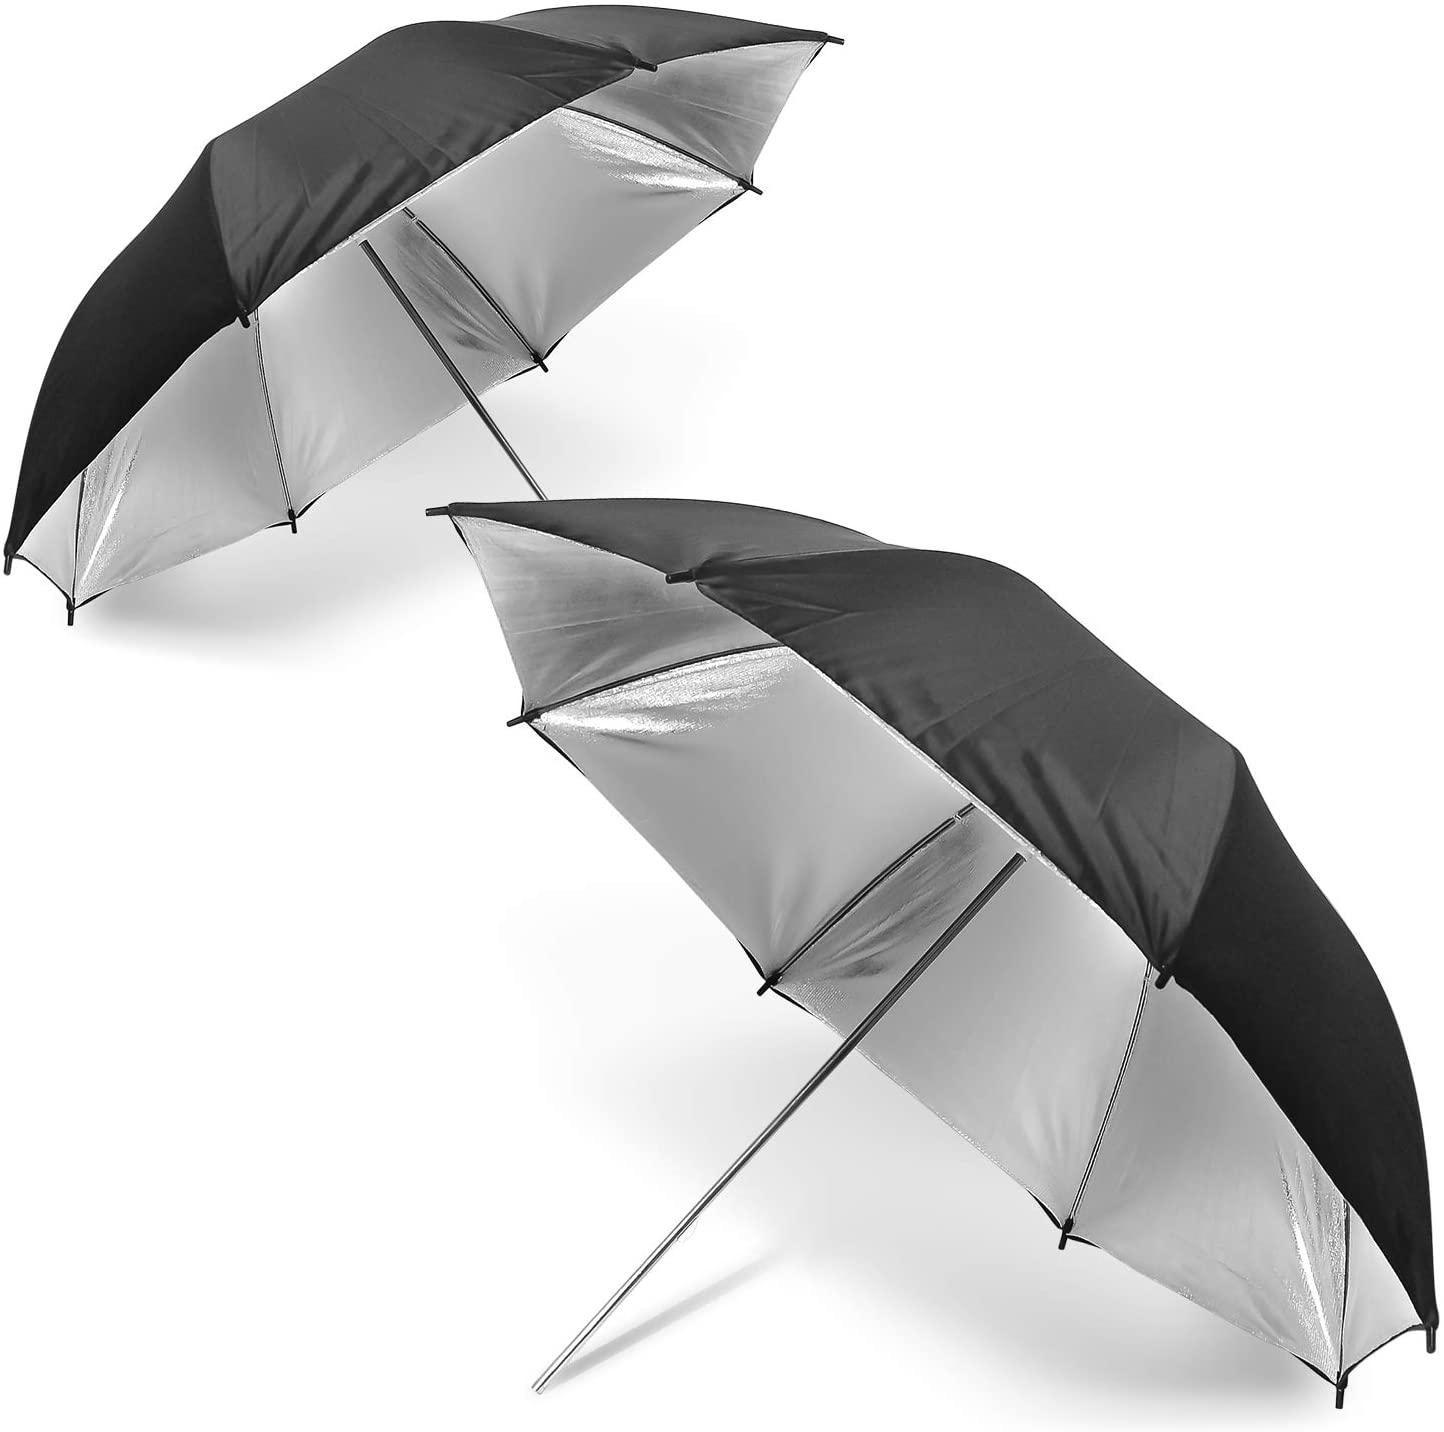 Julius Studio,33″ Wide Black/Silver Premium Bounce Umbrella Light Modifier with 8mm Shaft Diameter for Photo and Video Studio Shooting Pack of 2,JSAG501